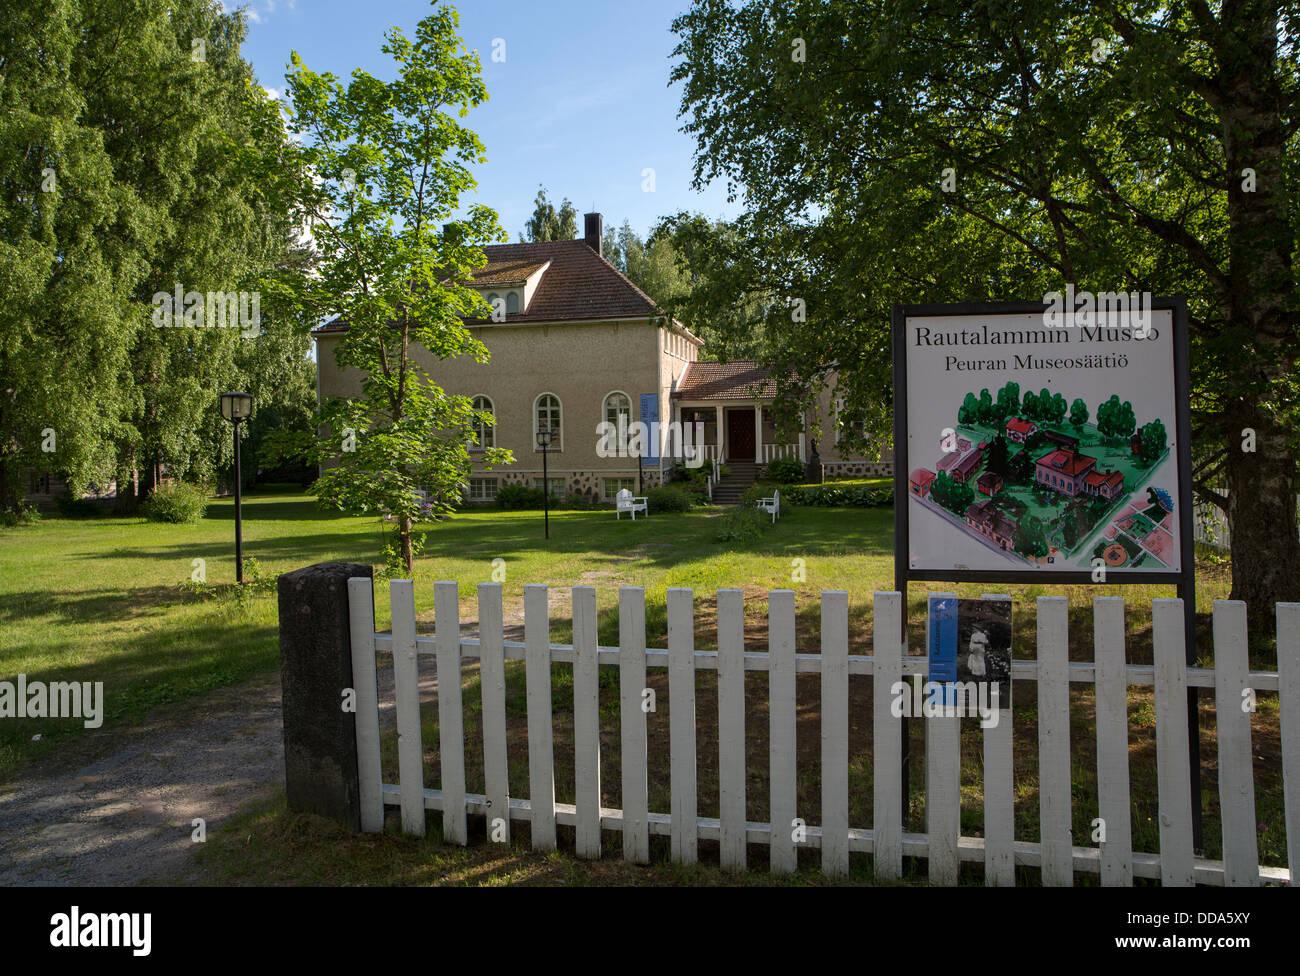 Rautalammin museo ( Peuran museo ) Rautalampi museum , Finland Stock Photo